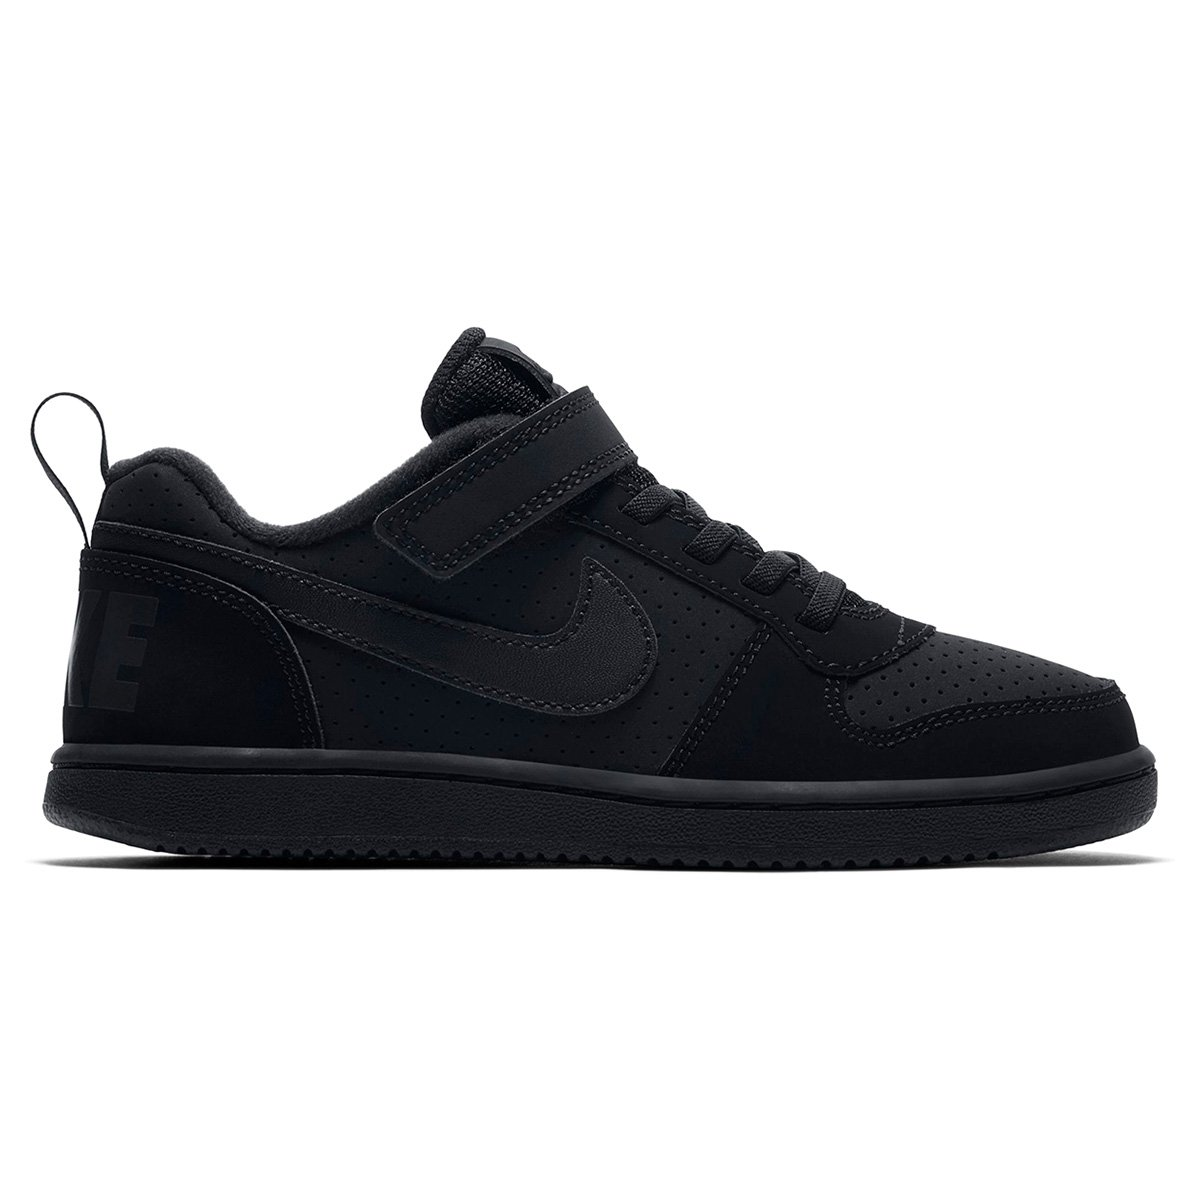 66f1d53b073 Tênis Infantil Nike Court Borough Low - Preto - Compre Agora